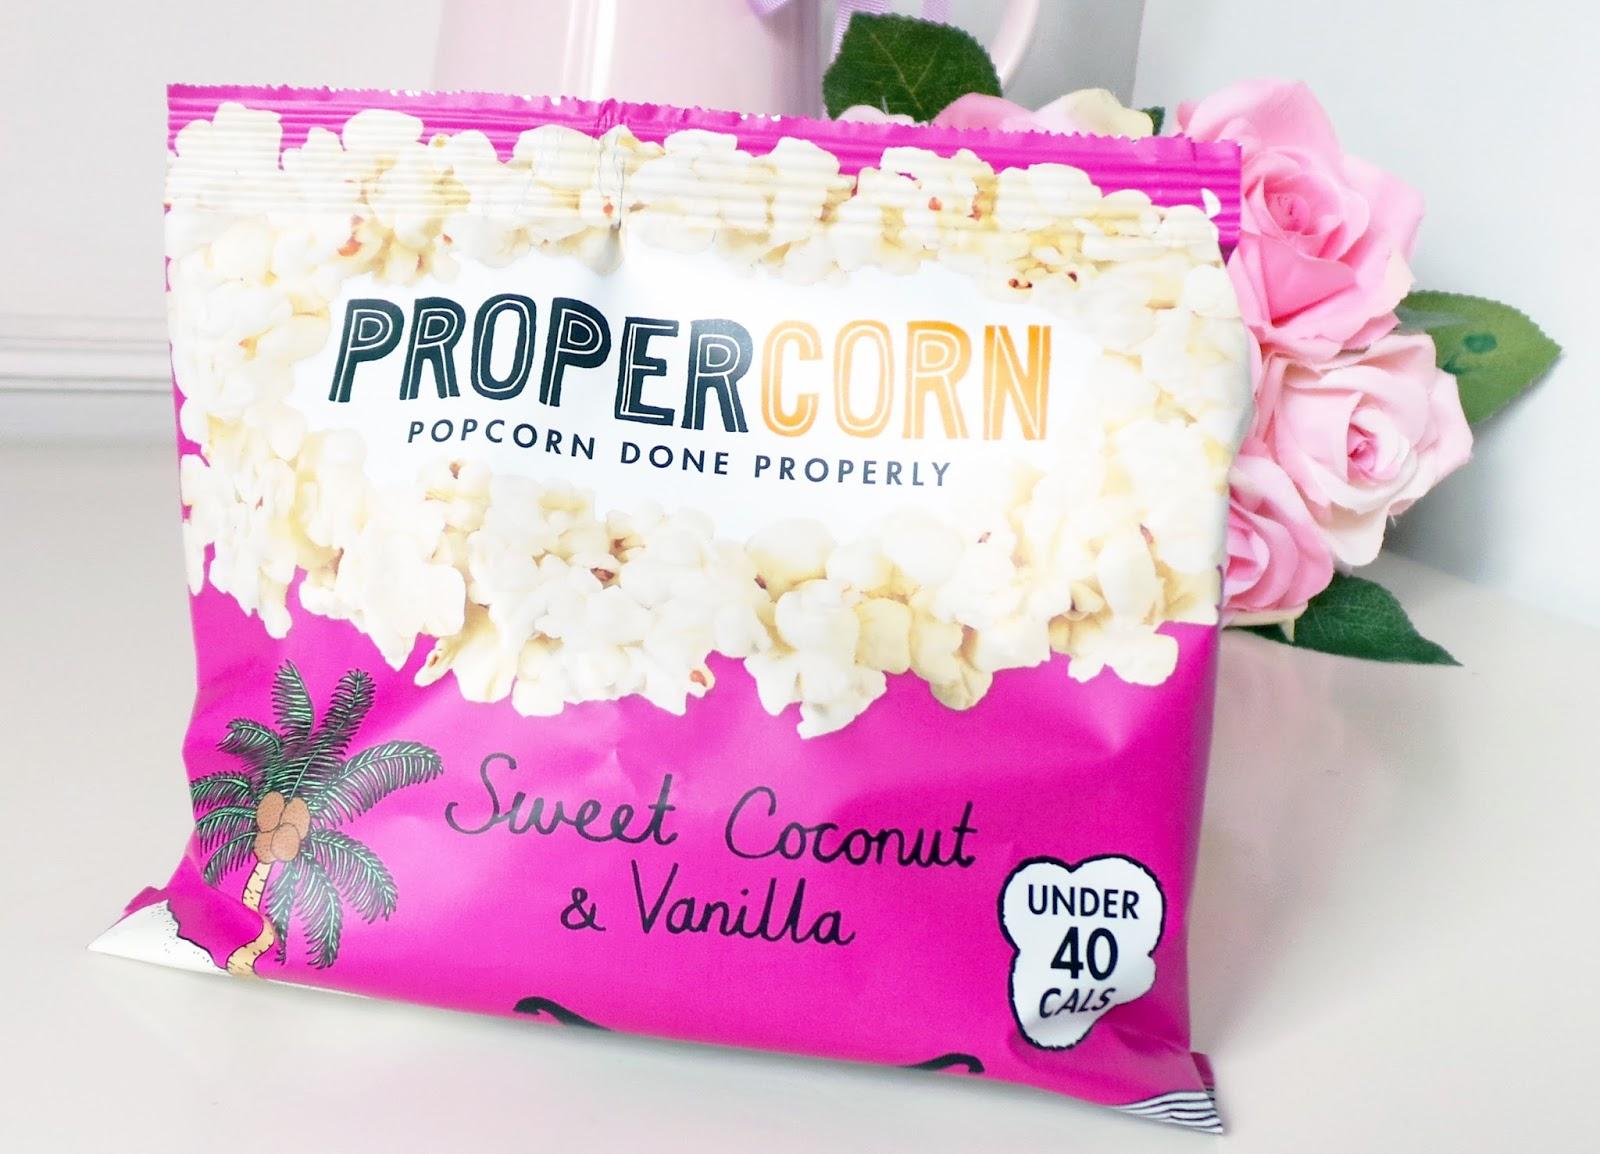 birchbox  Propercorn Sweet Coconut & Vanilla Popcorn review